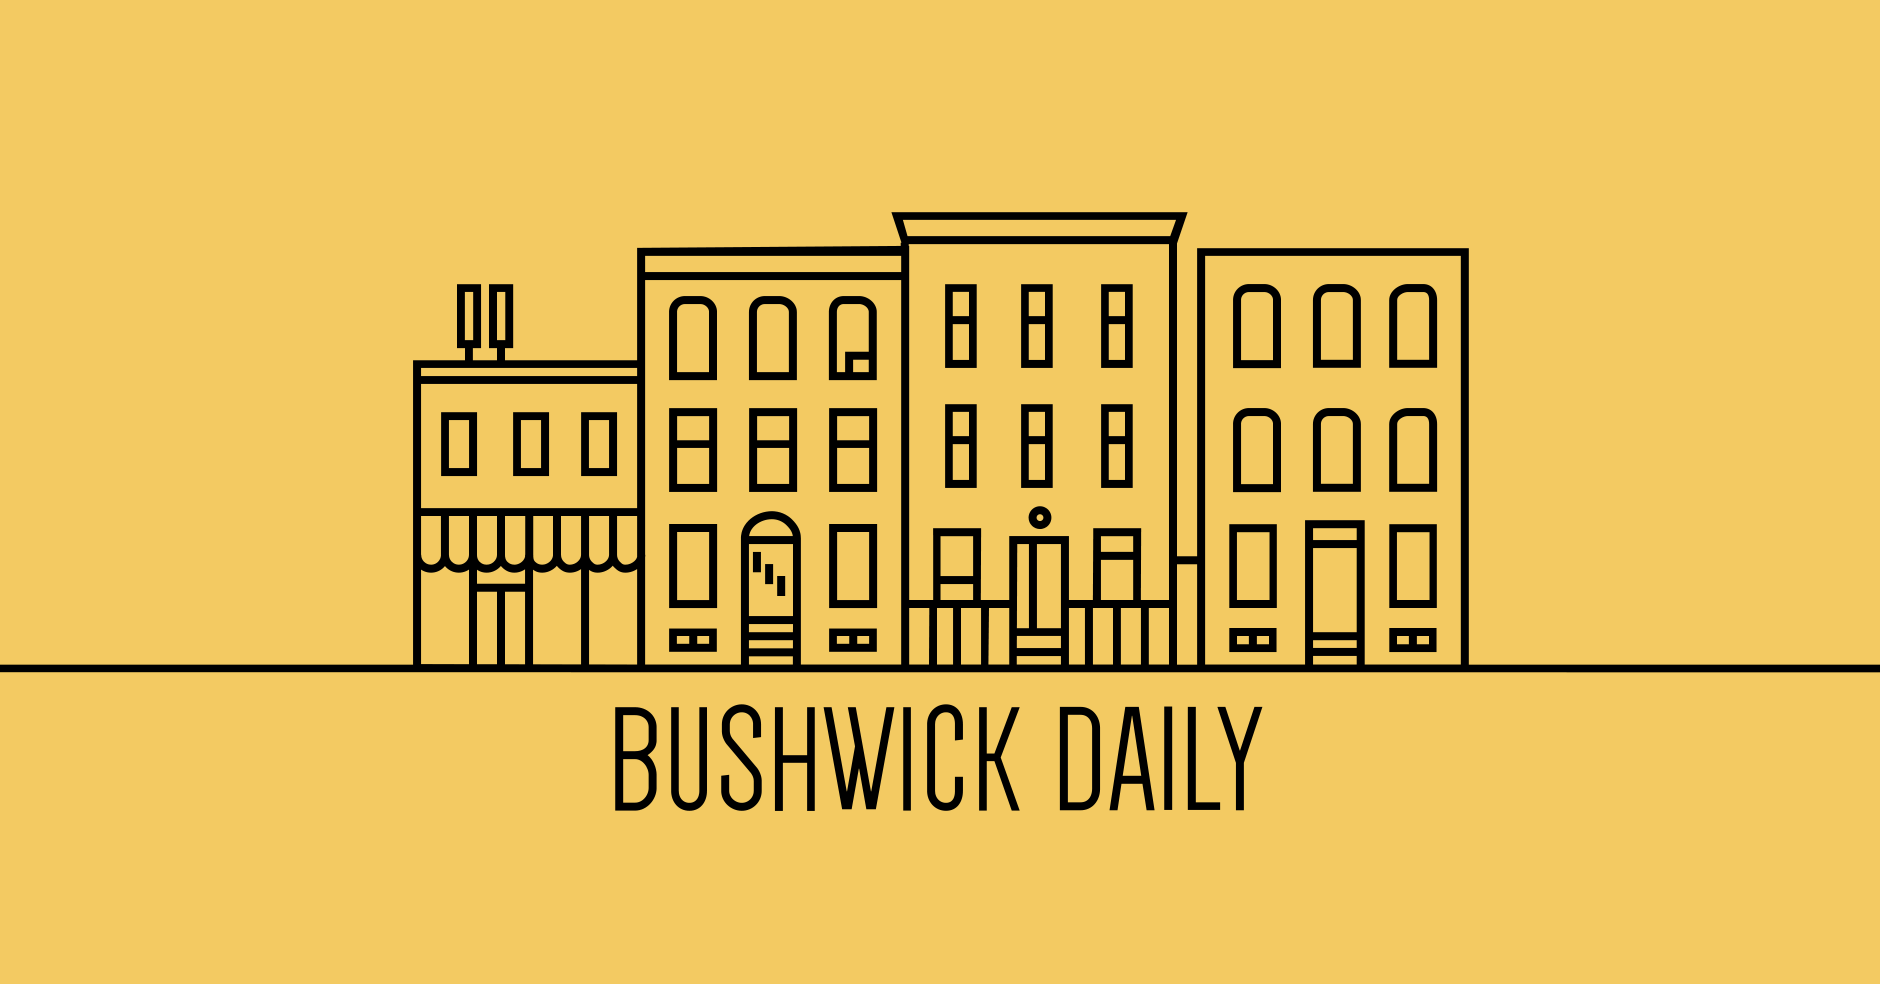 BUSHWICK DAILY -